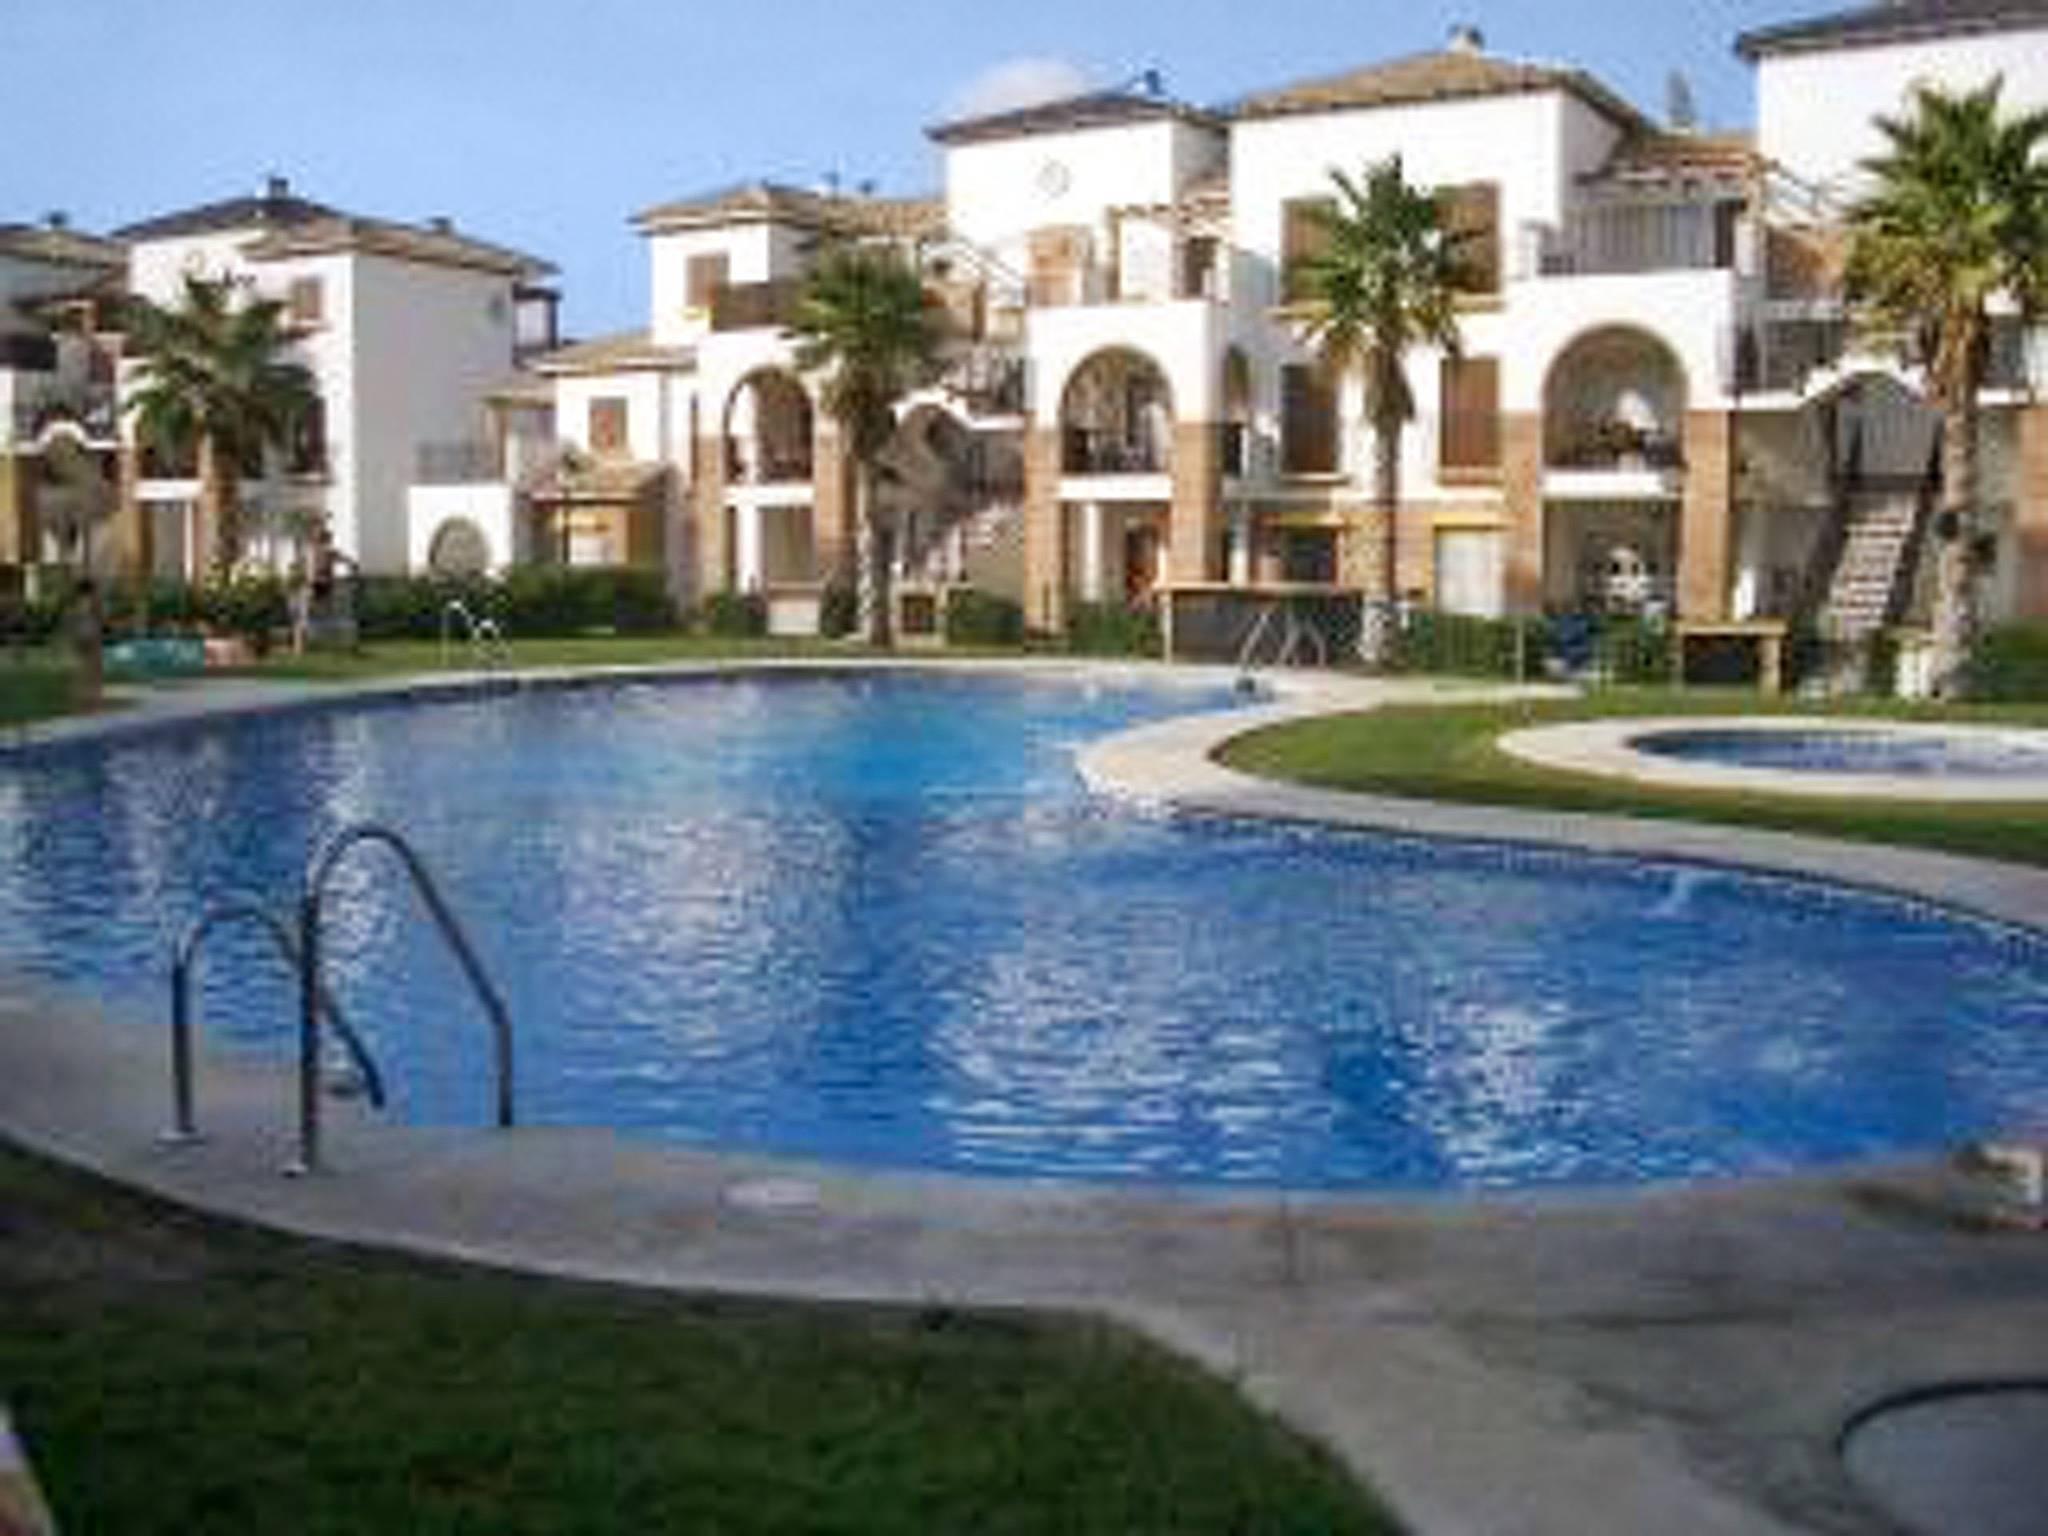 Bonito apt con acceso piscina puerto rey vera almer a for Piscinas almeria